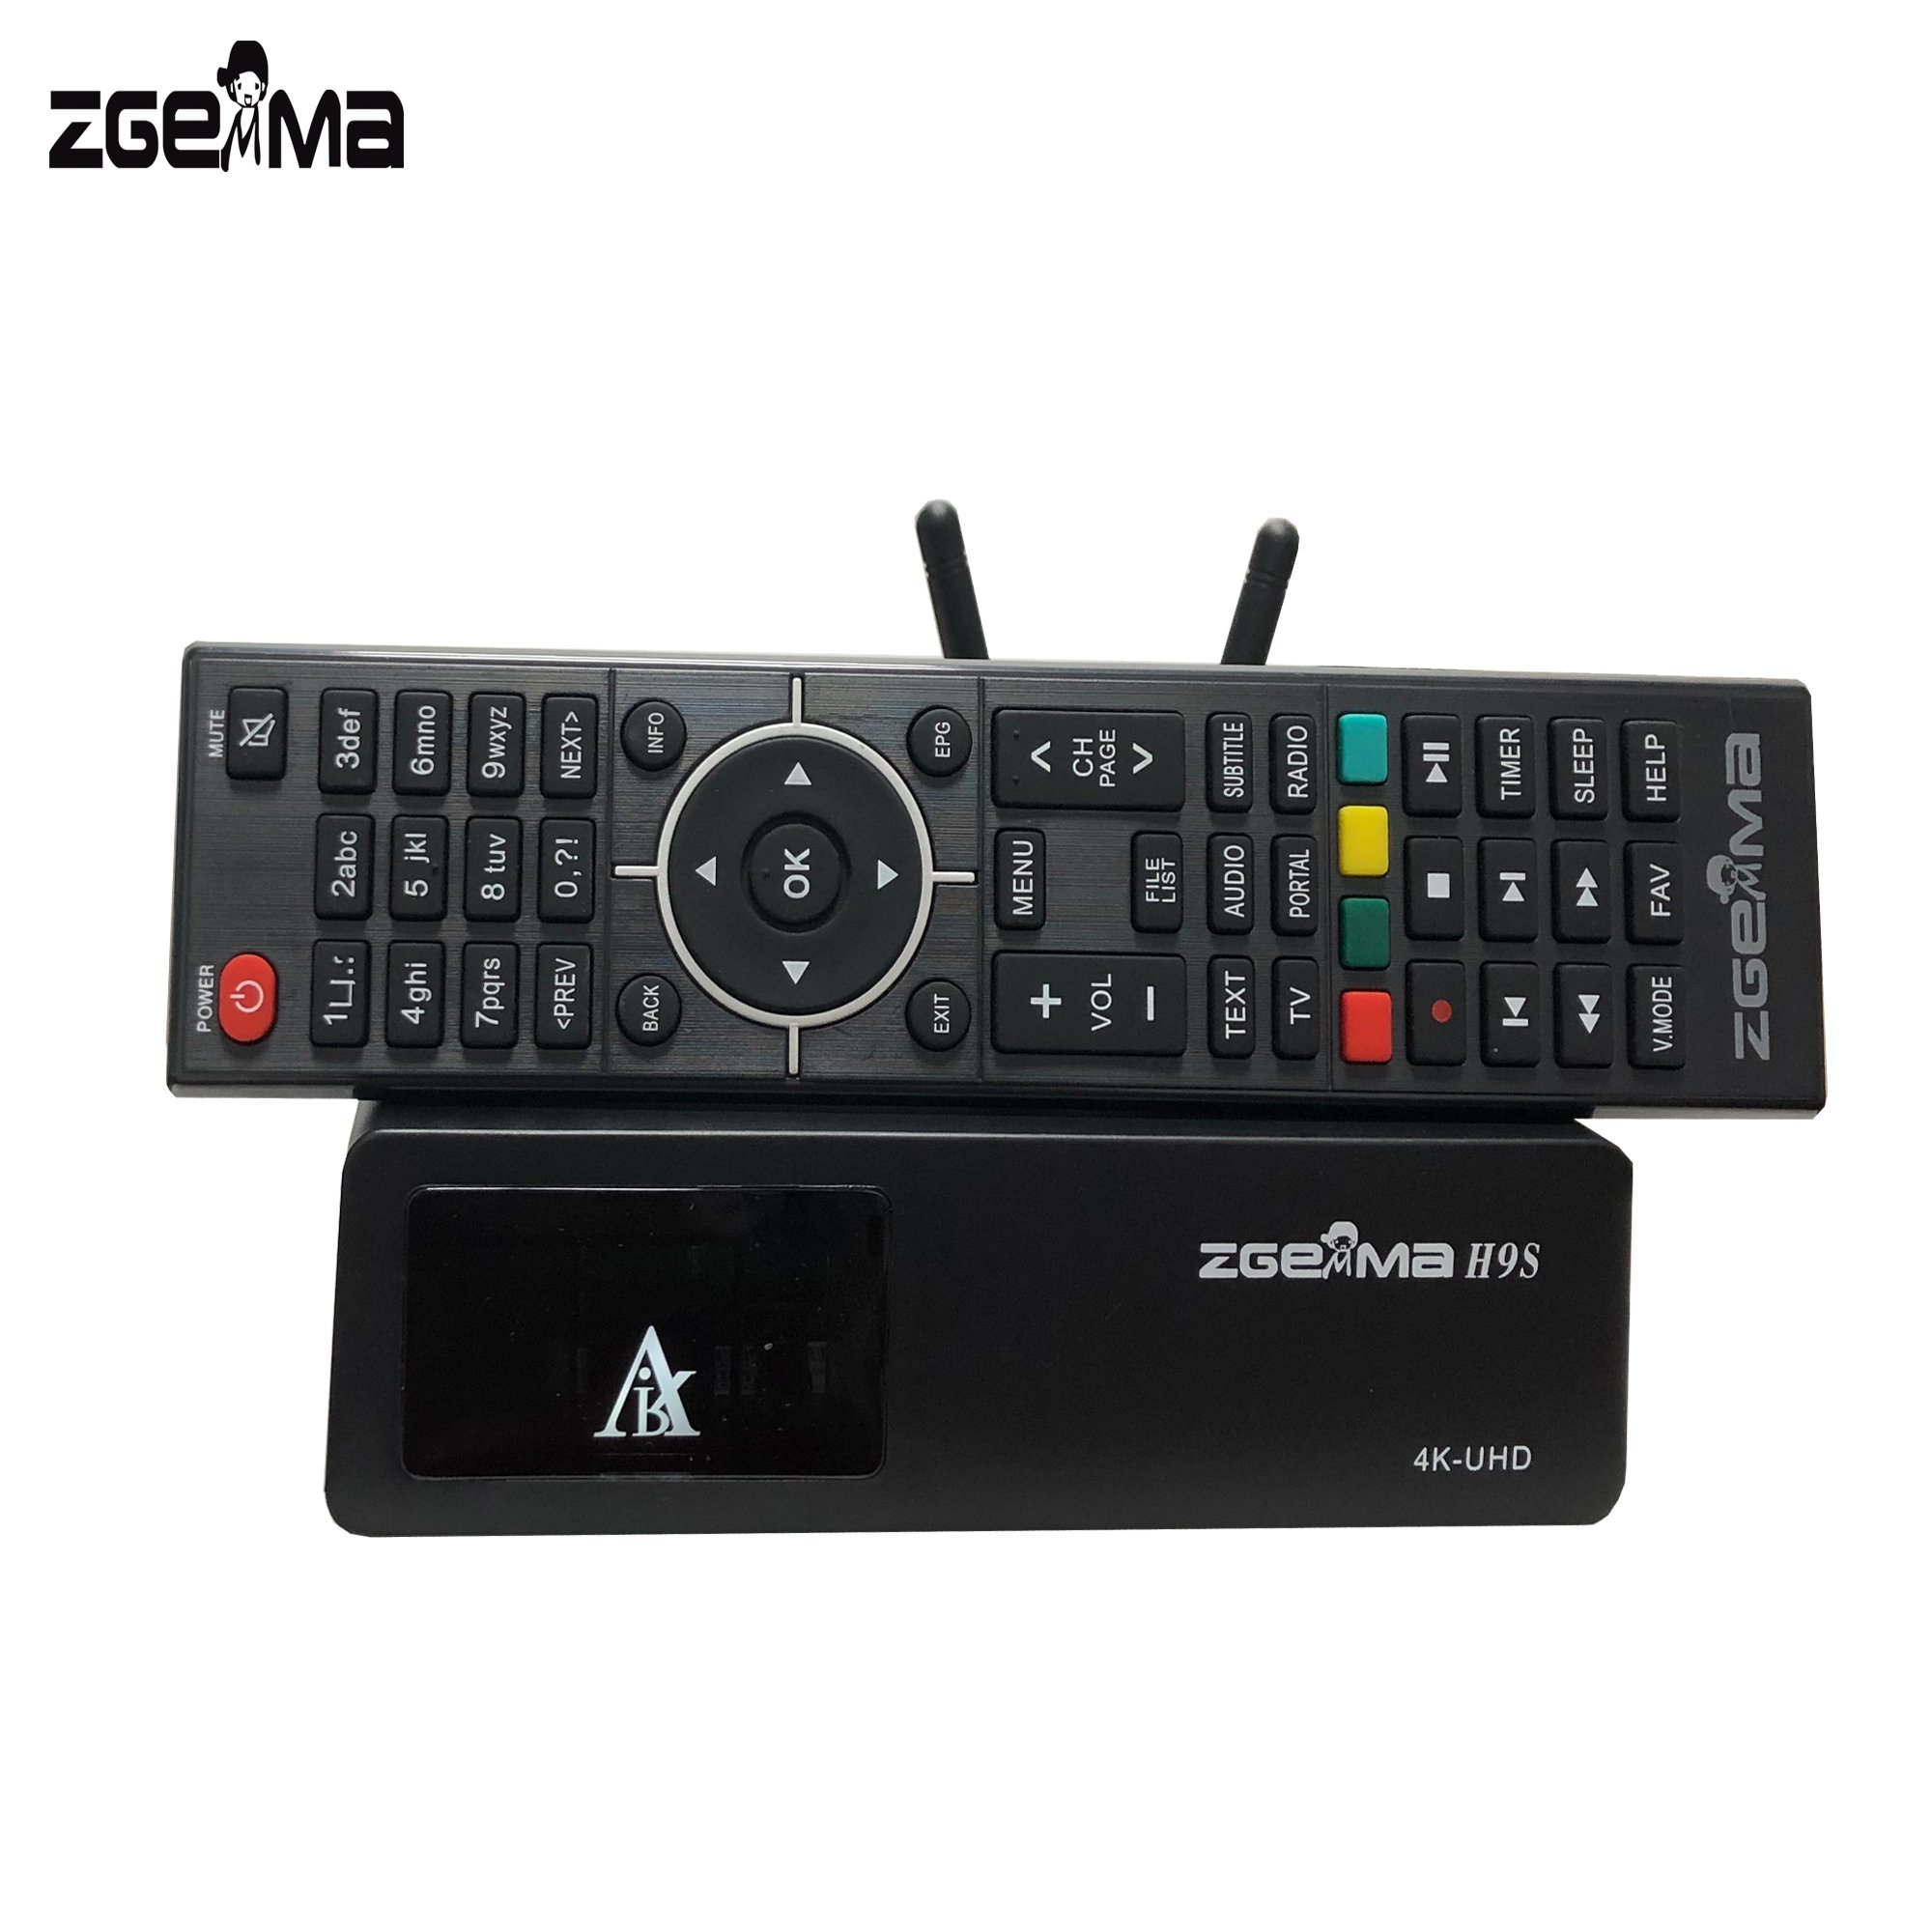 [Hot Item] Zgemma H9s with WiFi DVB-S2X 4K UHD Satellite Receiver